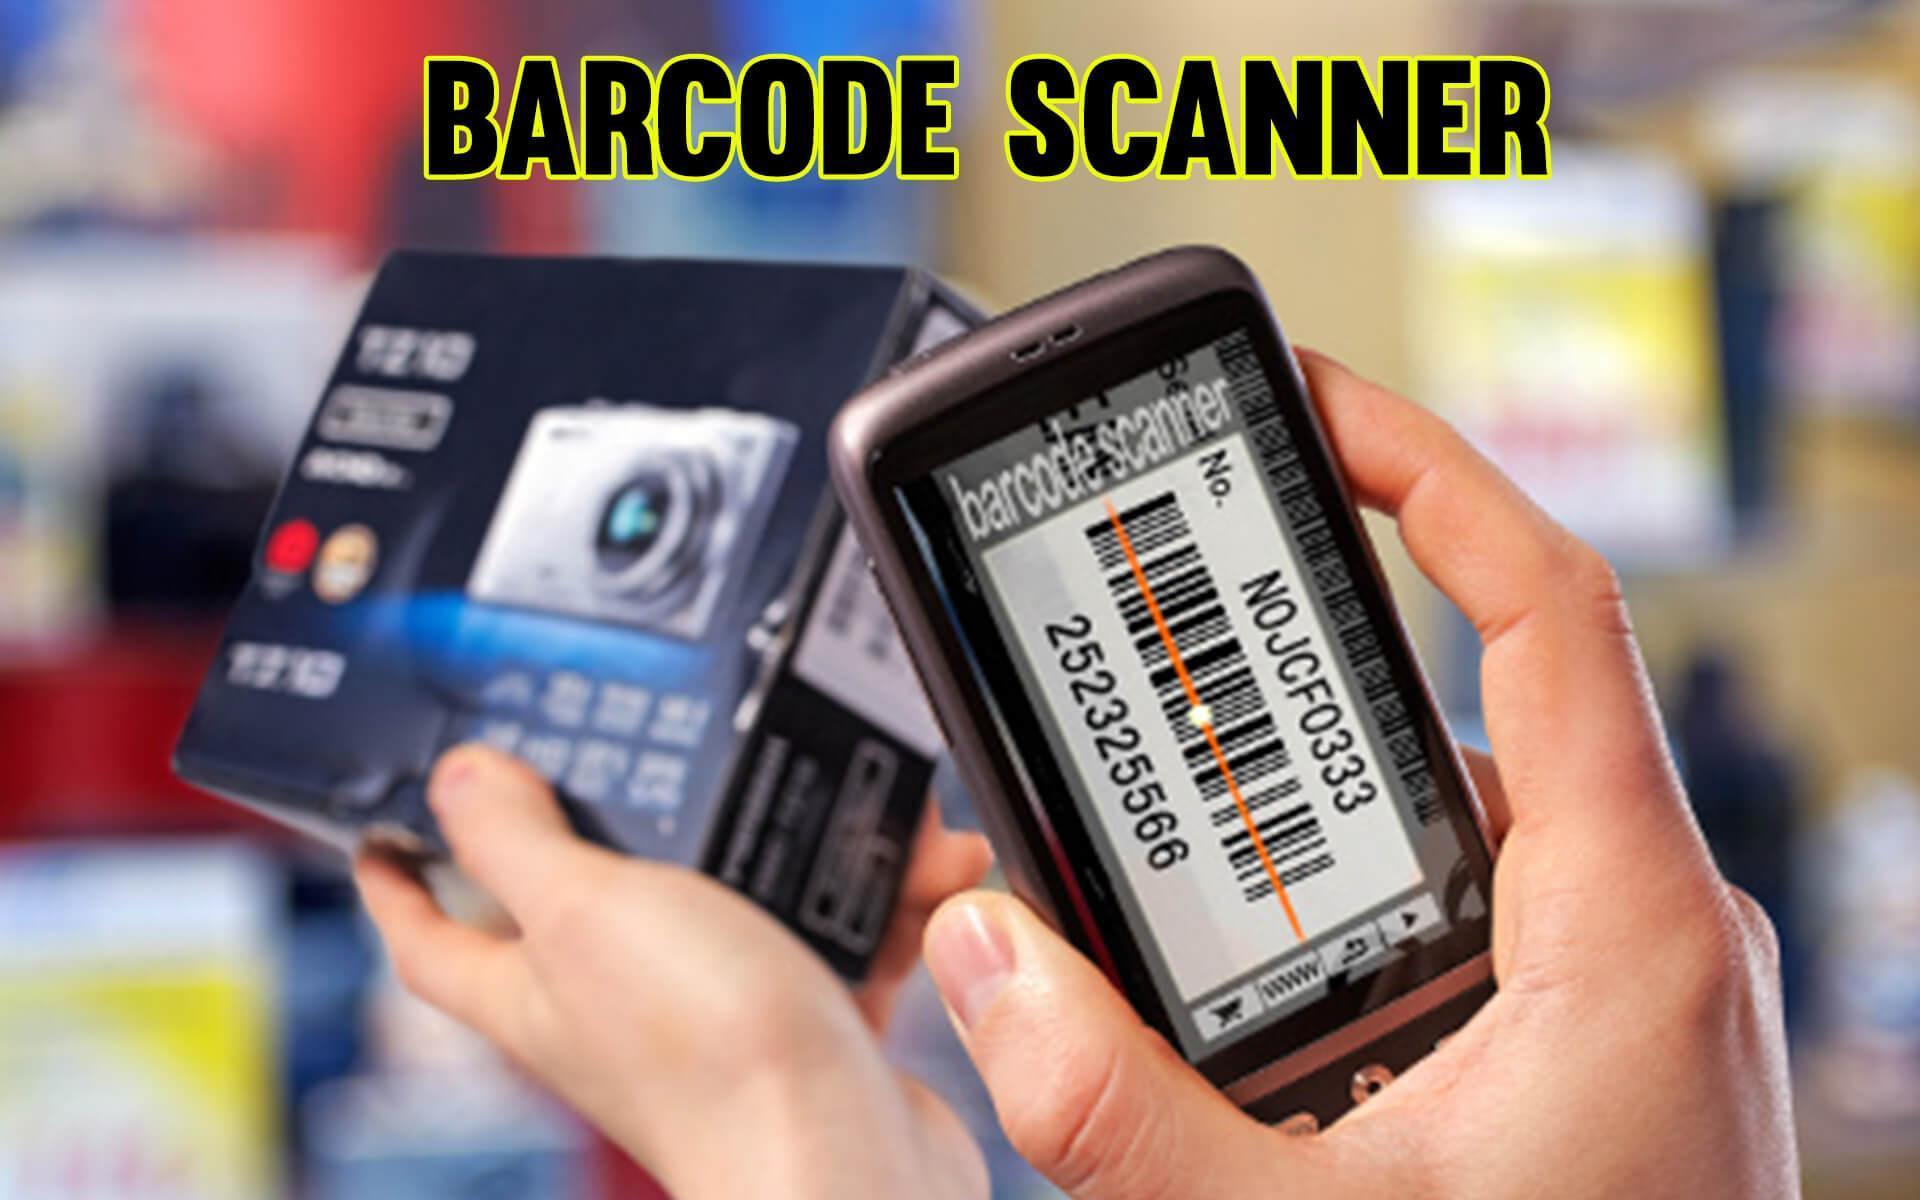 QR Code & Barcode Scanner Agmikor